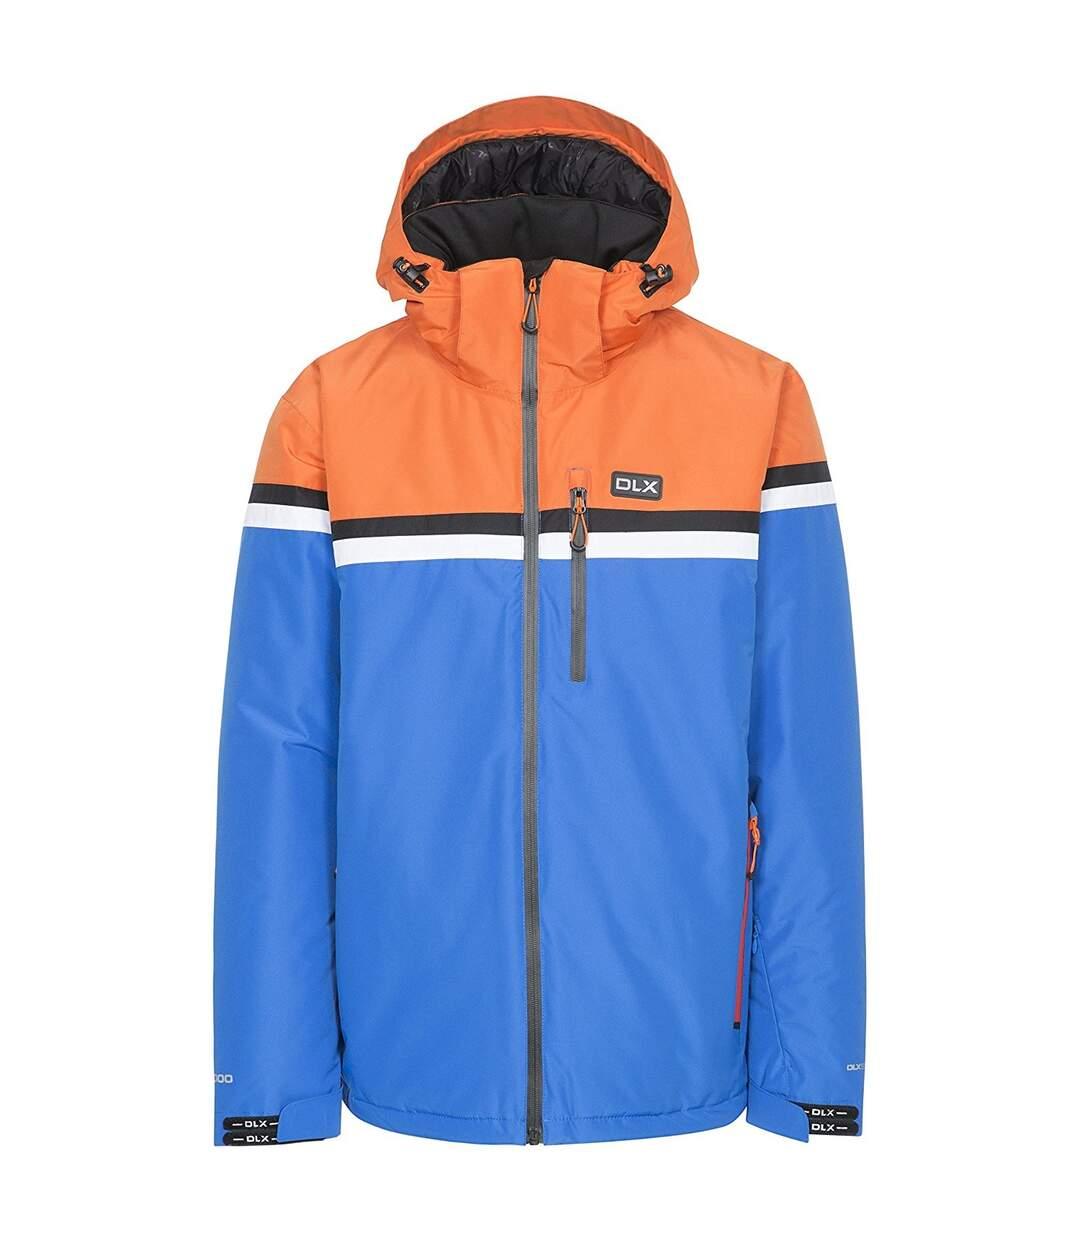 Trespass Mens Niven DLX Waterproof Ski Jacket (Blue) - UTTP3788